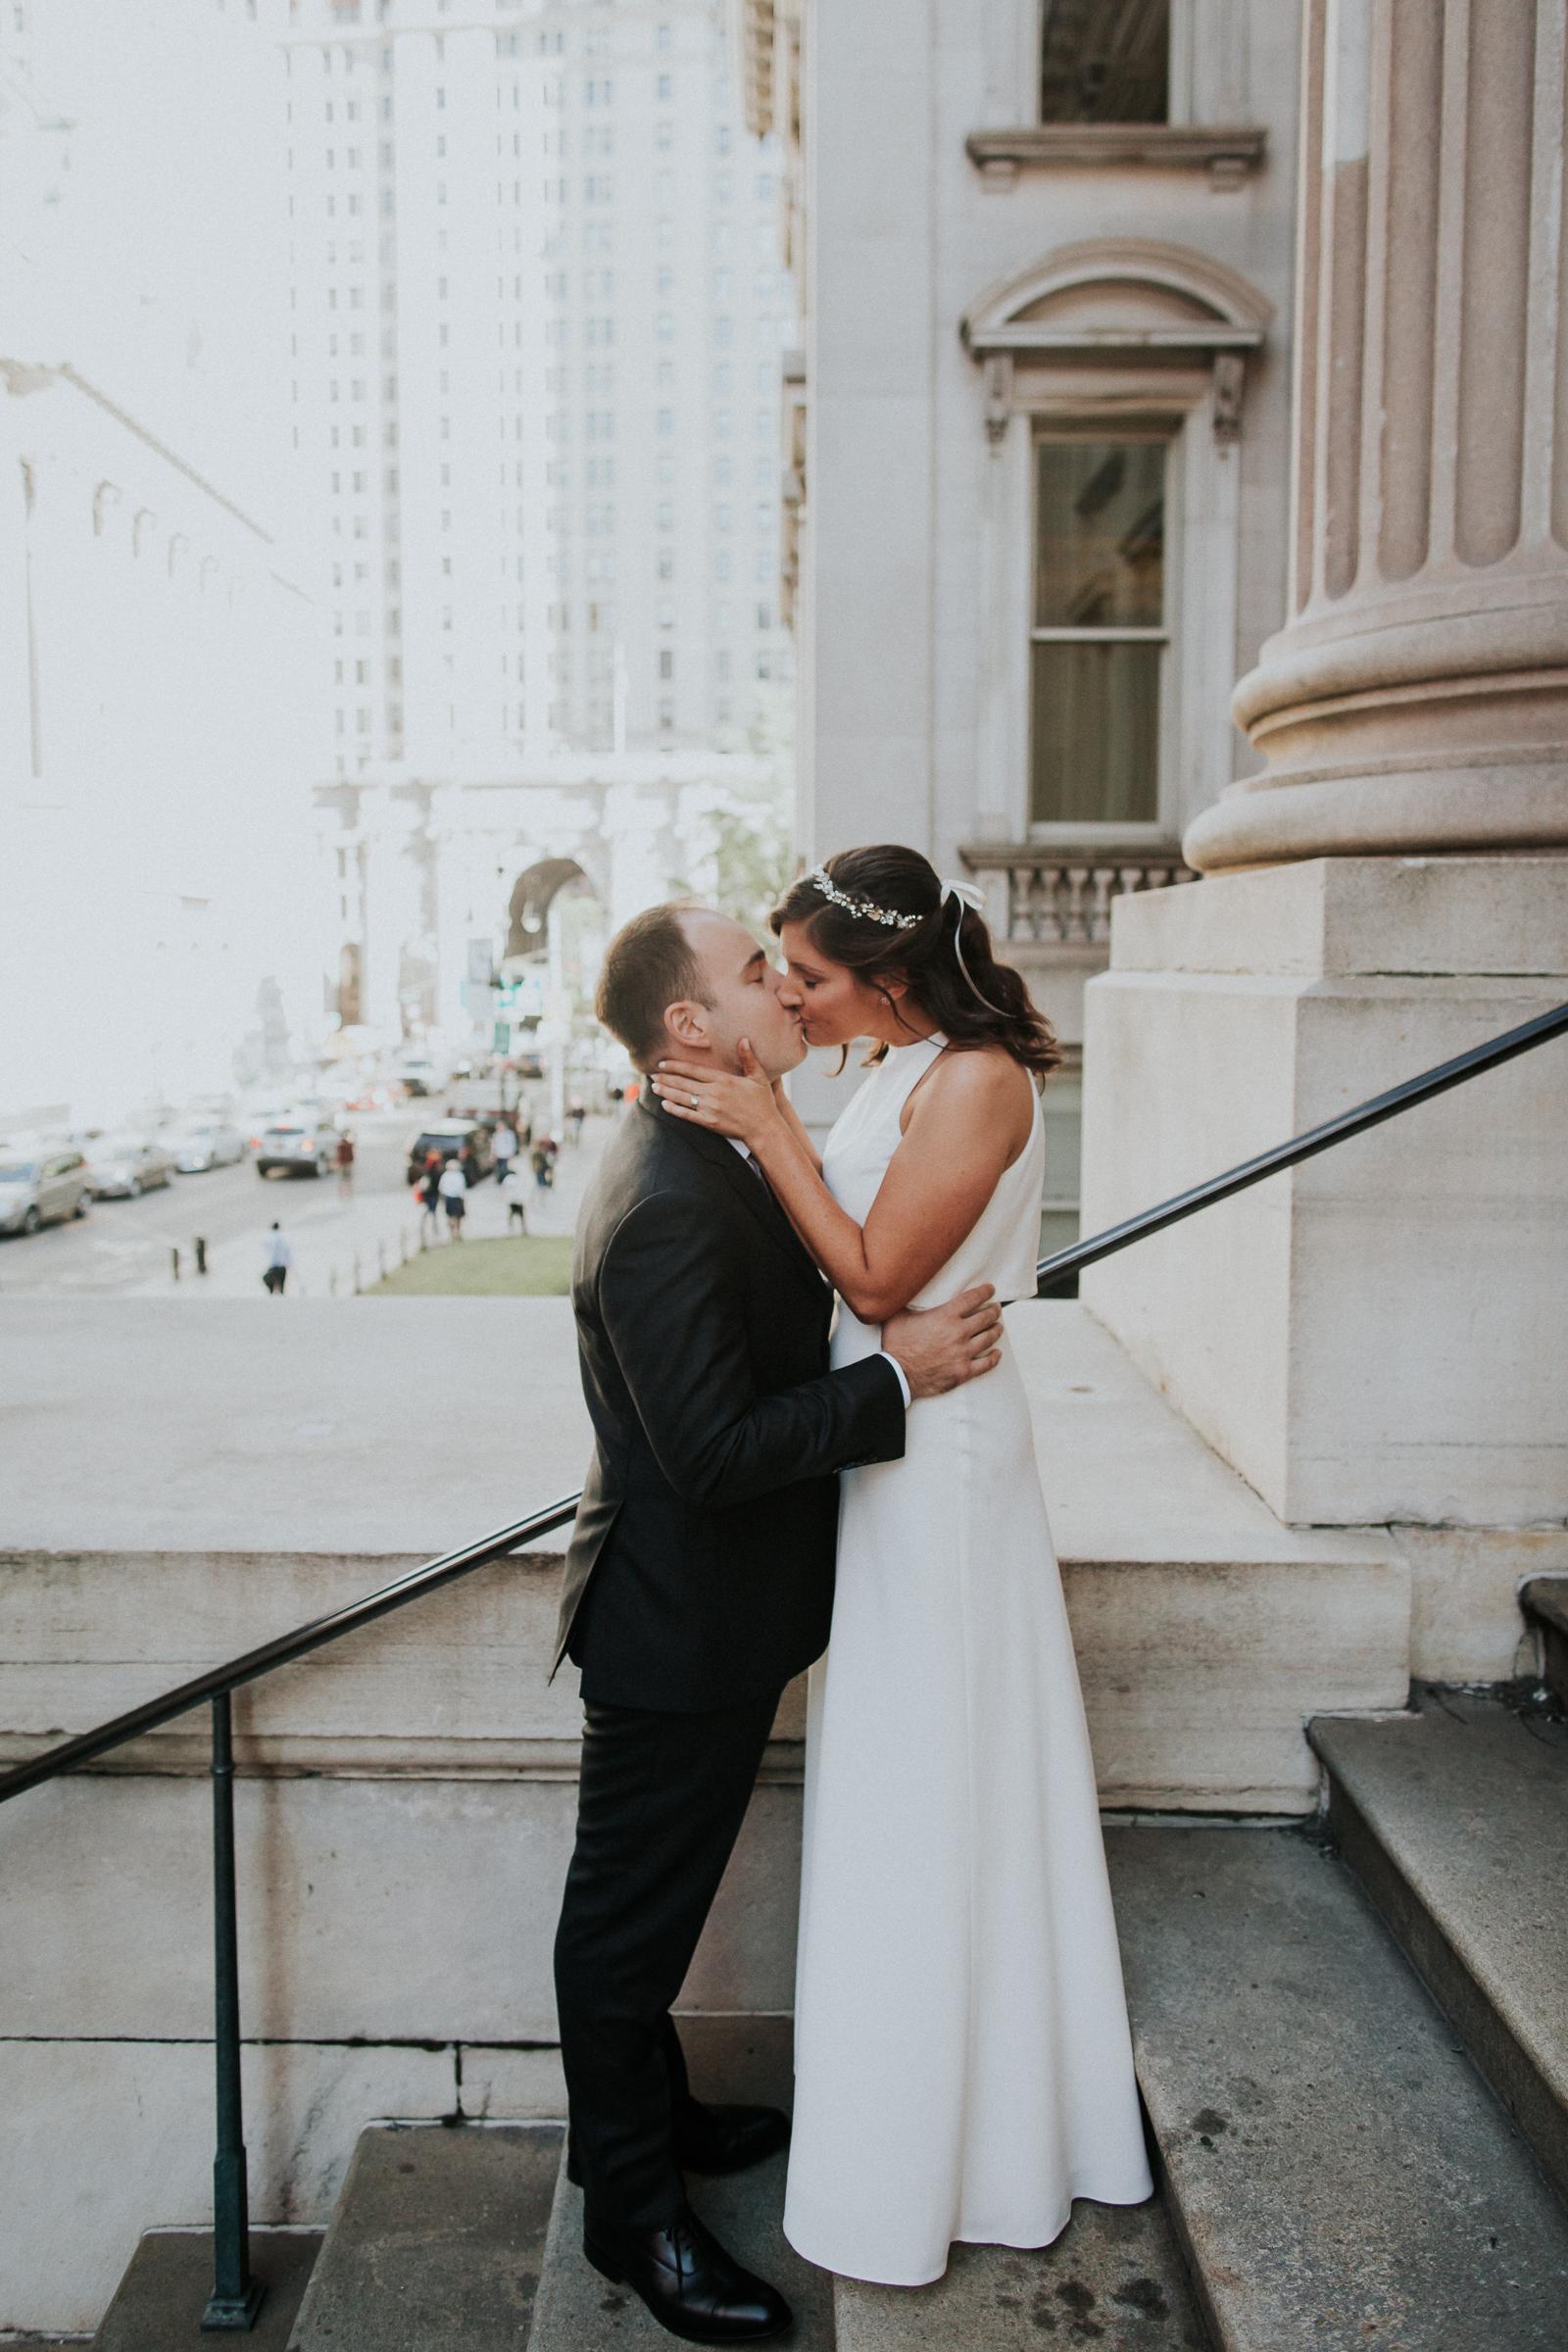 Casa-Apicii-Intimate-Wedding-City-Hall-Elopement-New-York-Documentary-Wedding-Photographer-21.jpg